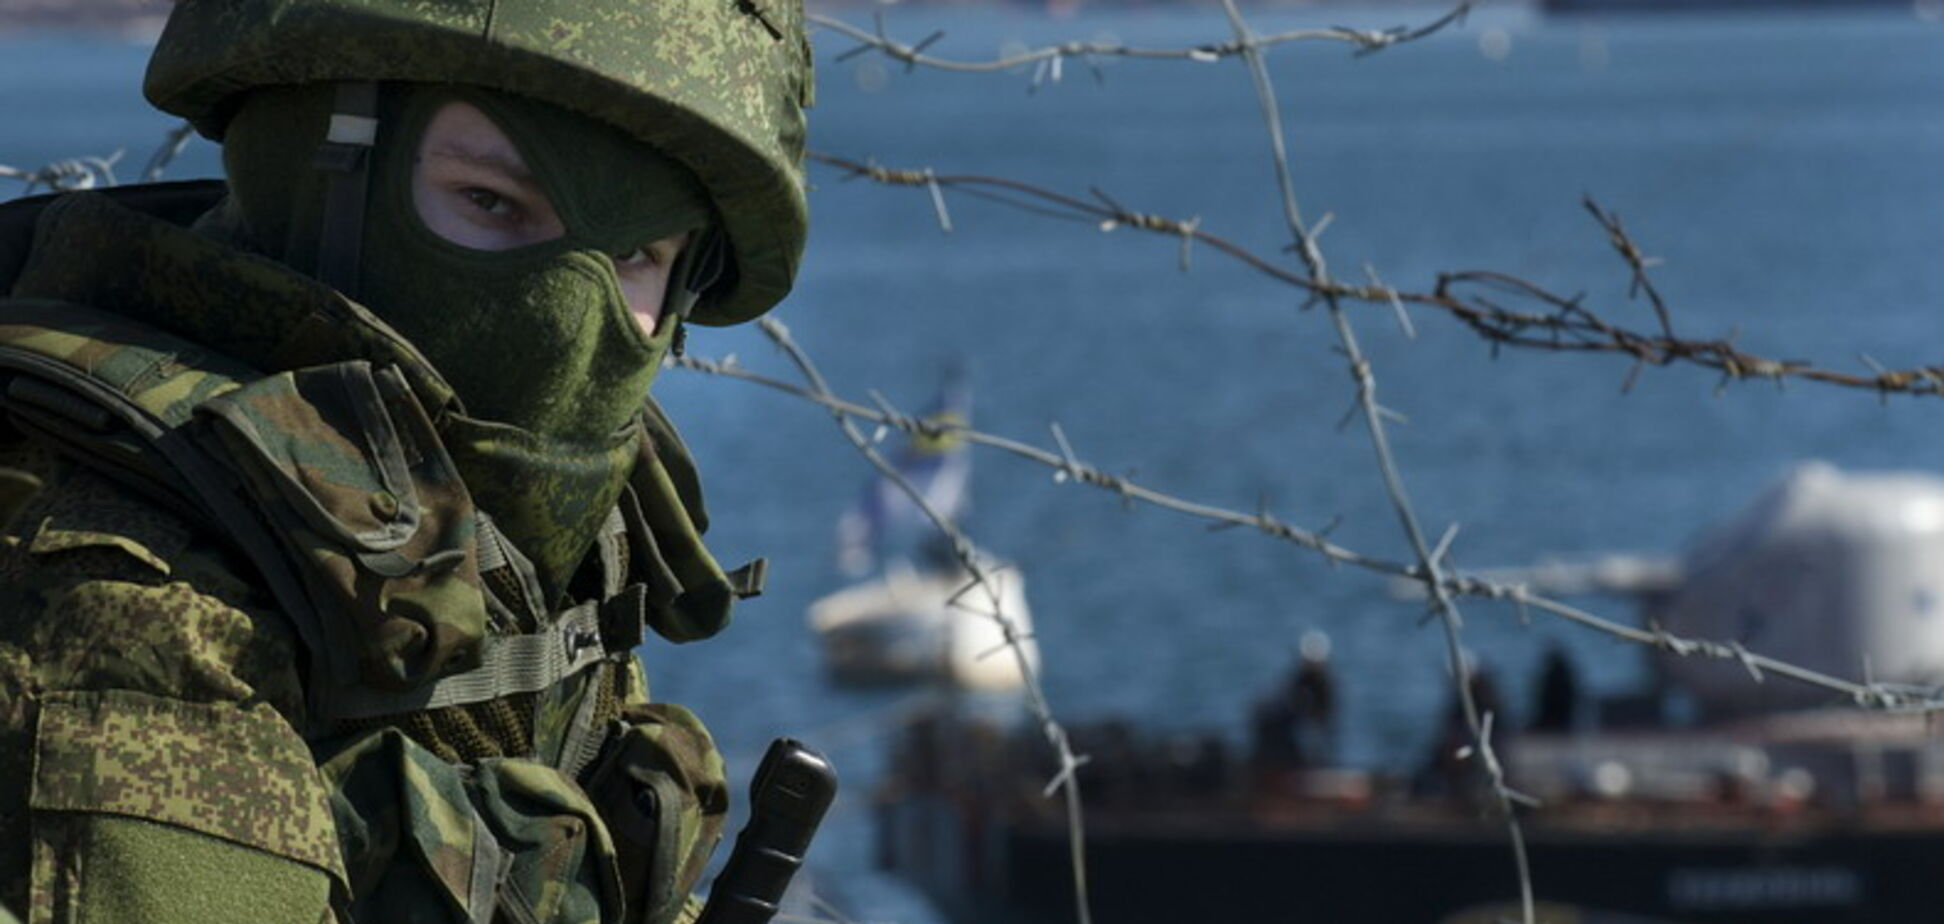 Слава Рабинович сказав, коли Україна поверне Крим